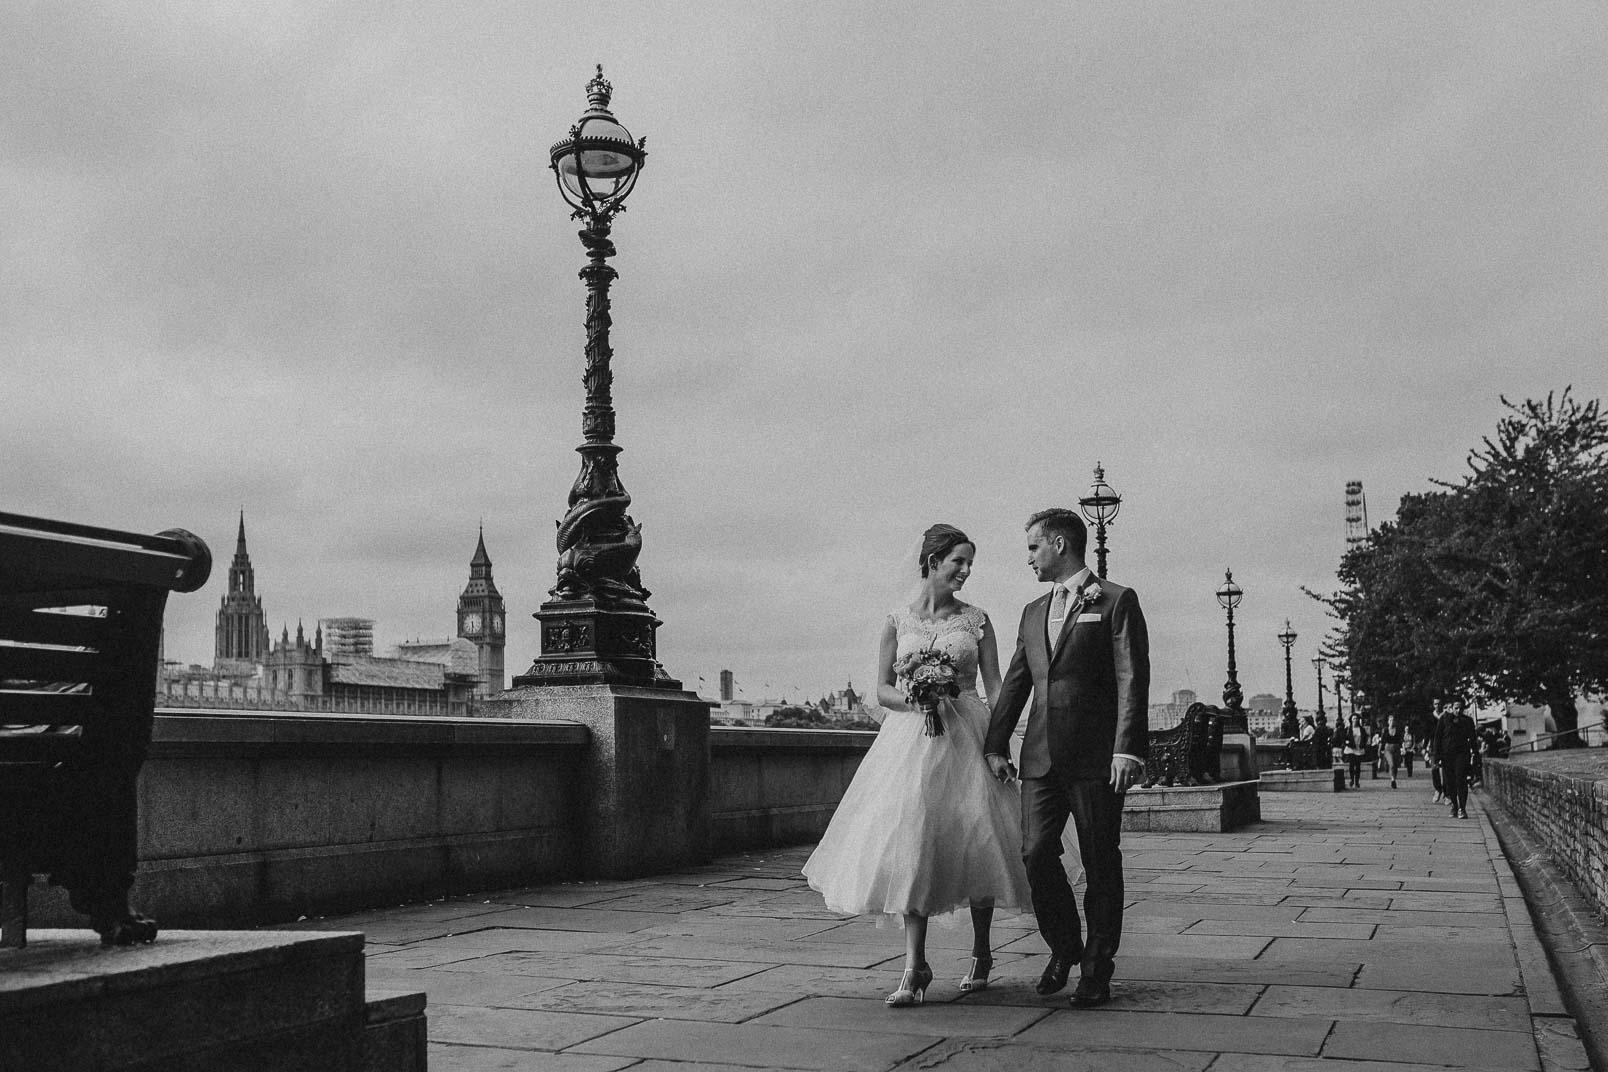 Garden Museum - Professional wedding photographer London 5